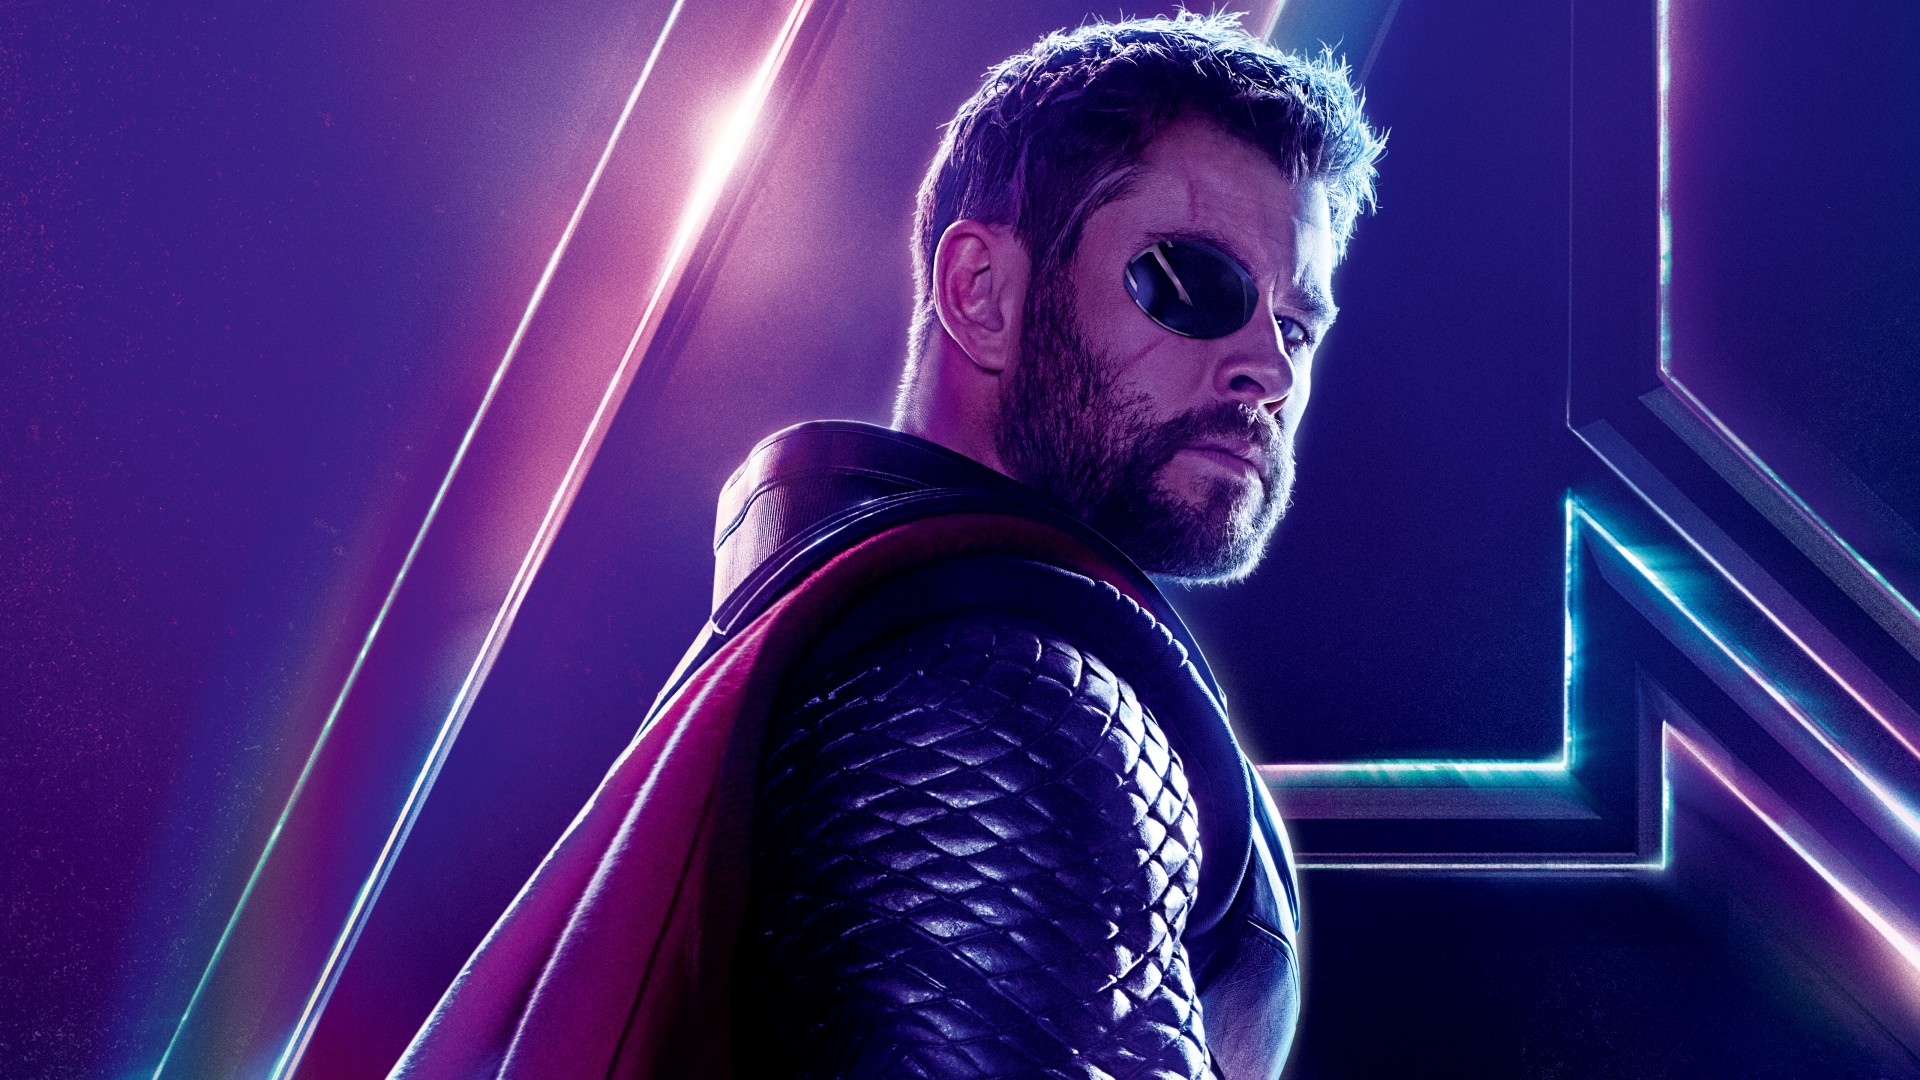 Thor Wallpaper Chris Hemsworth As Thor Thor Ragnarok Wallpaper 4k 2927964 Hd Wallpaper Backgrounds Download